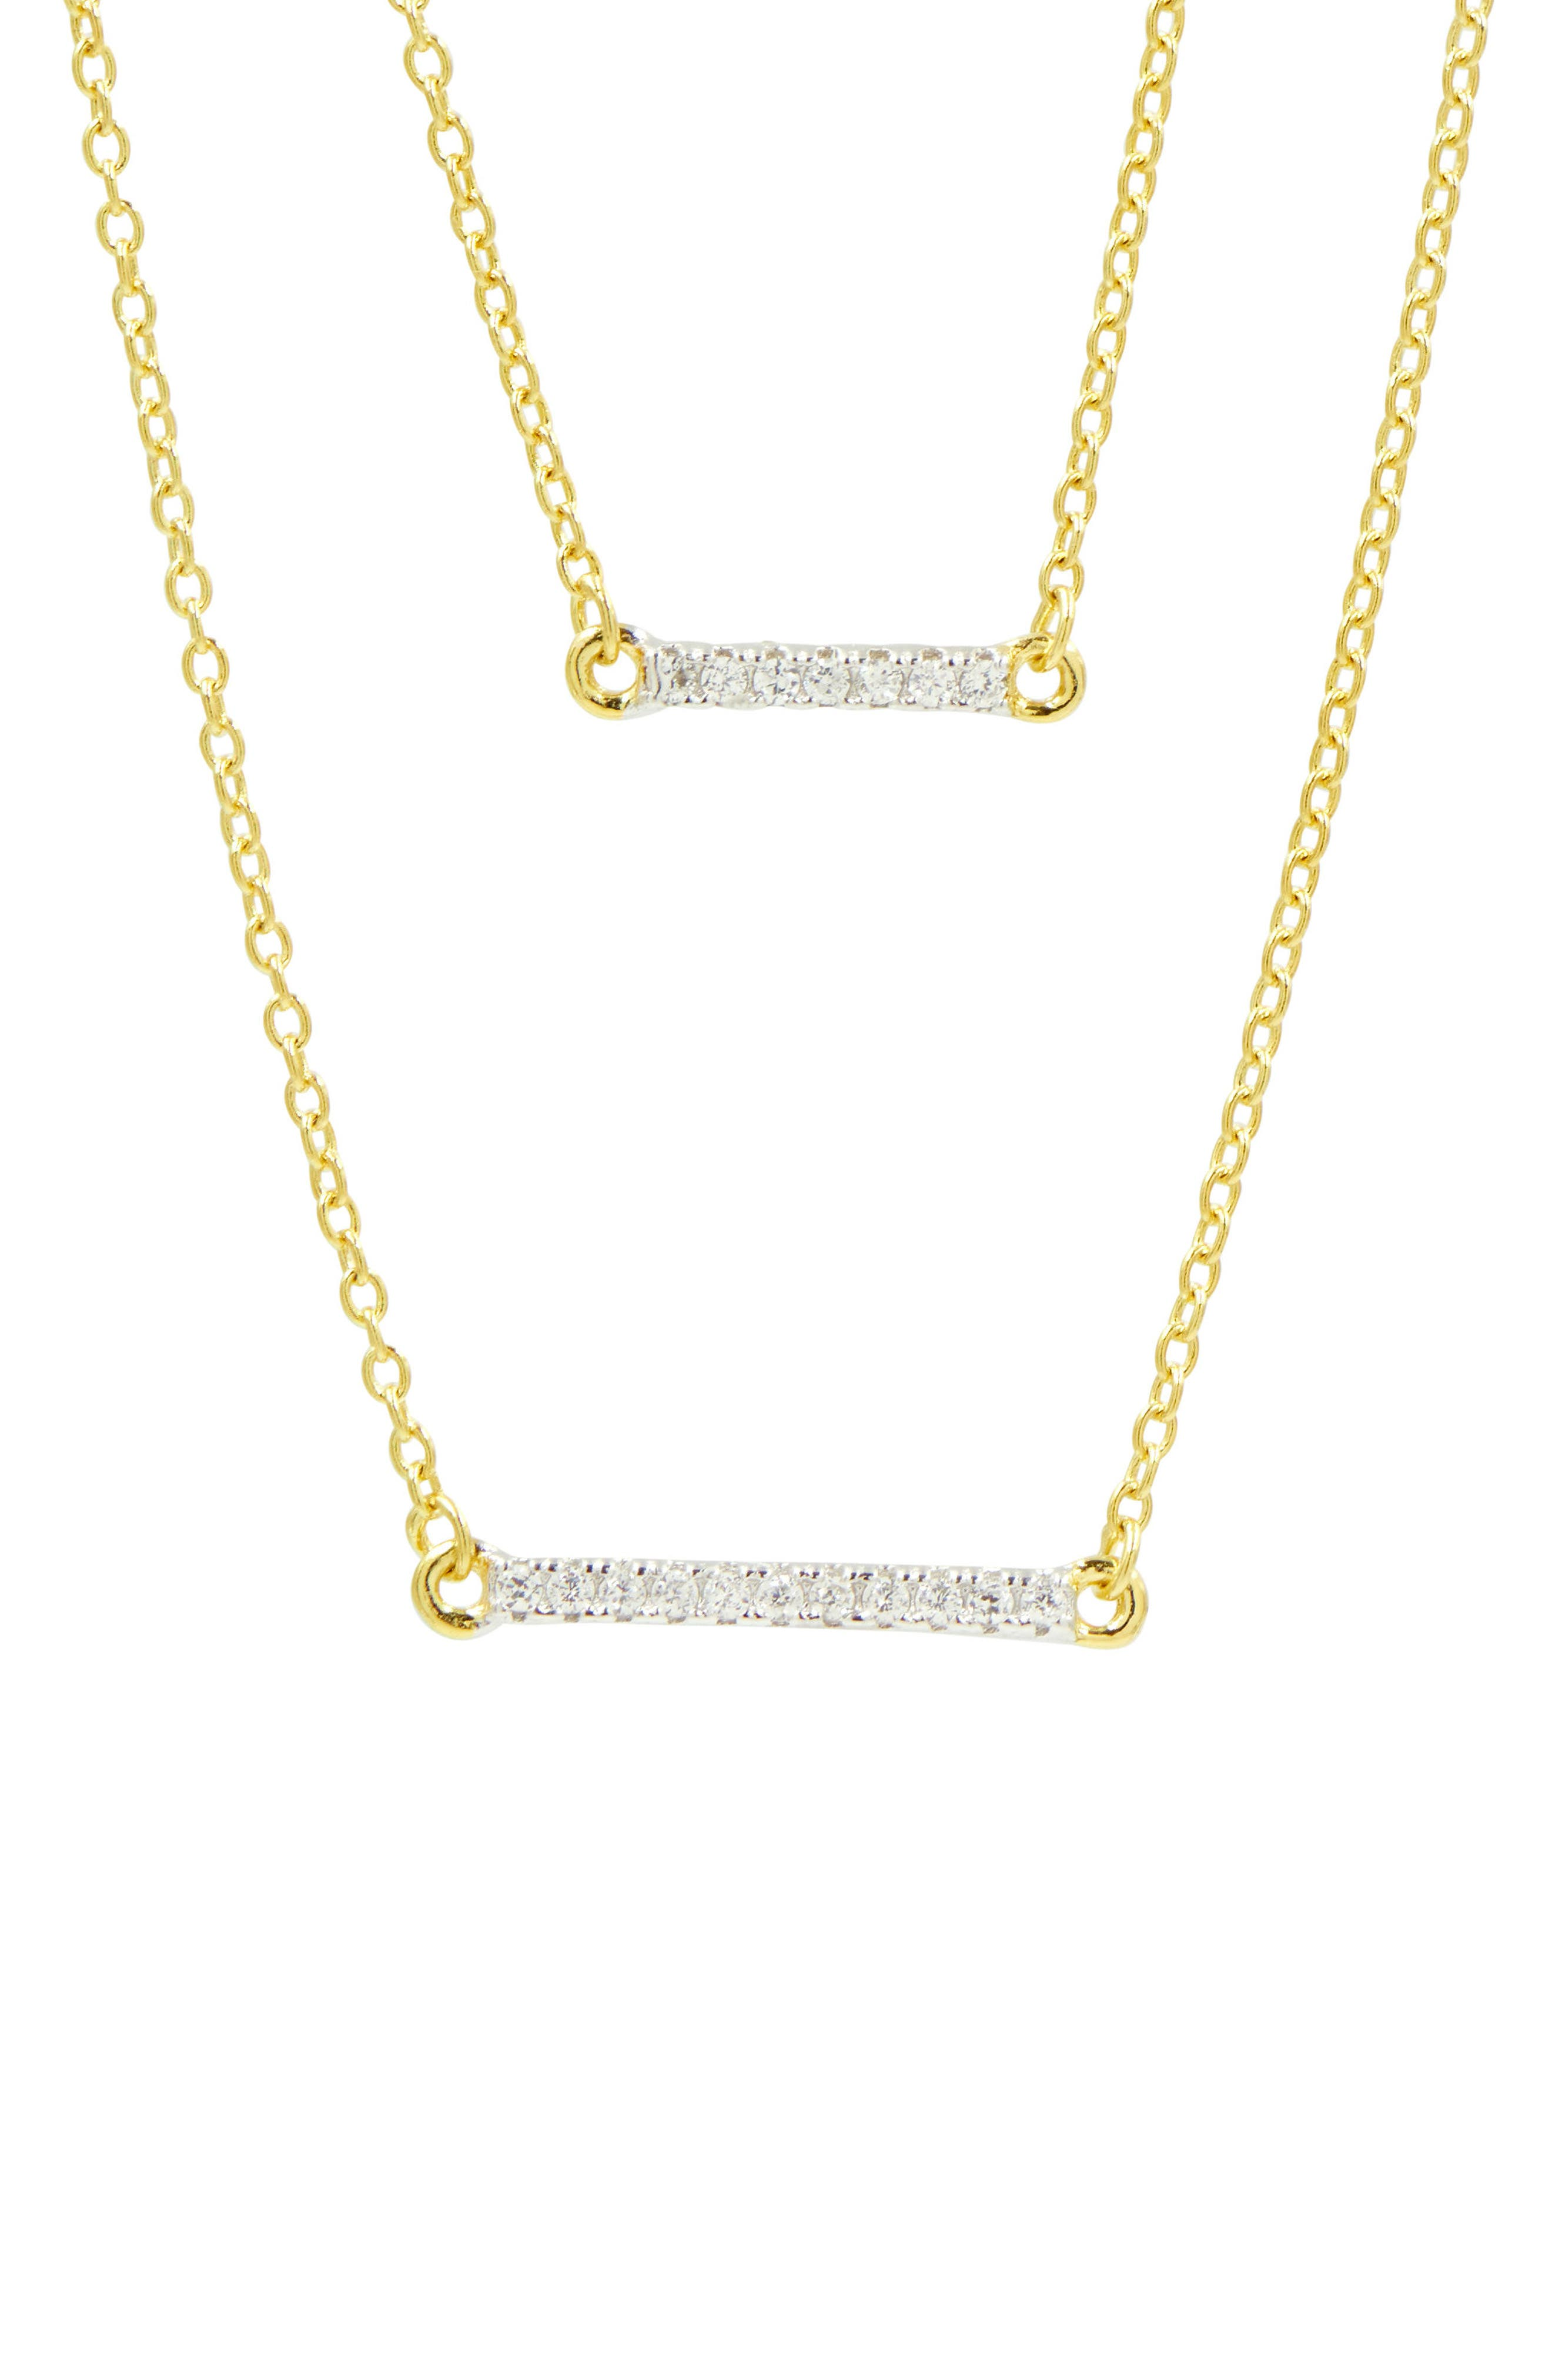 FREIDA ROTHMAN, Radiance Double Pendant Necklace, Alternate thumbnail 2, color, GOLD/ SILVER